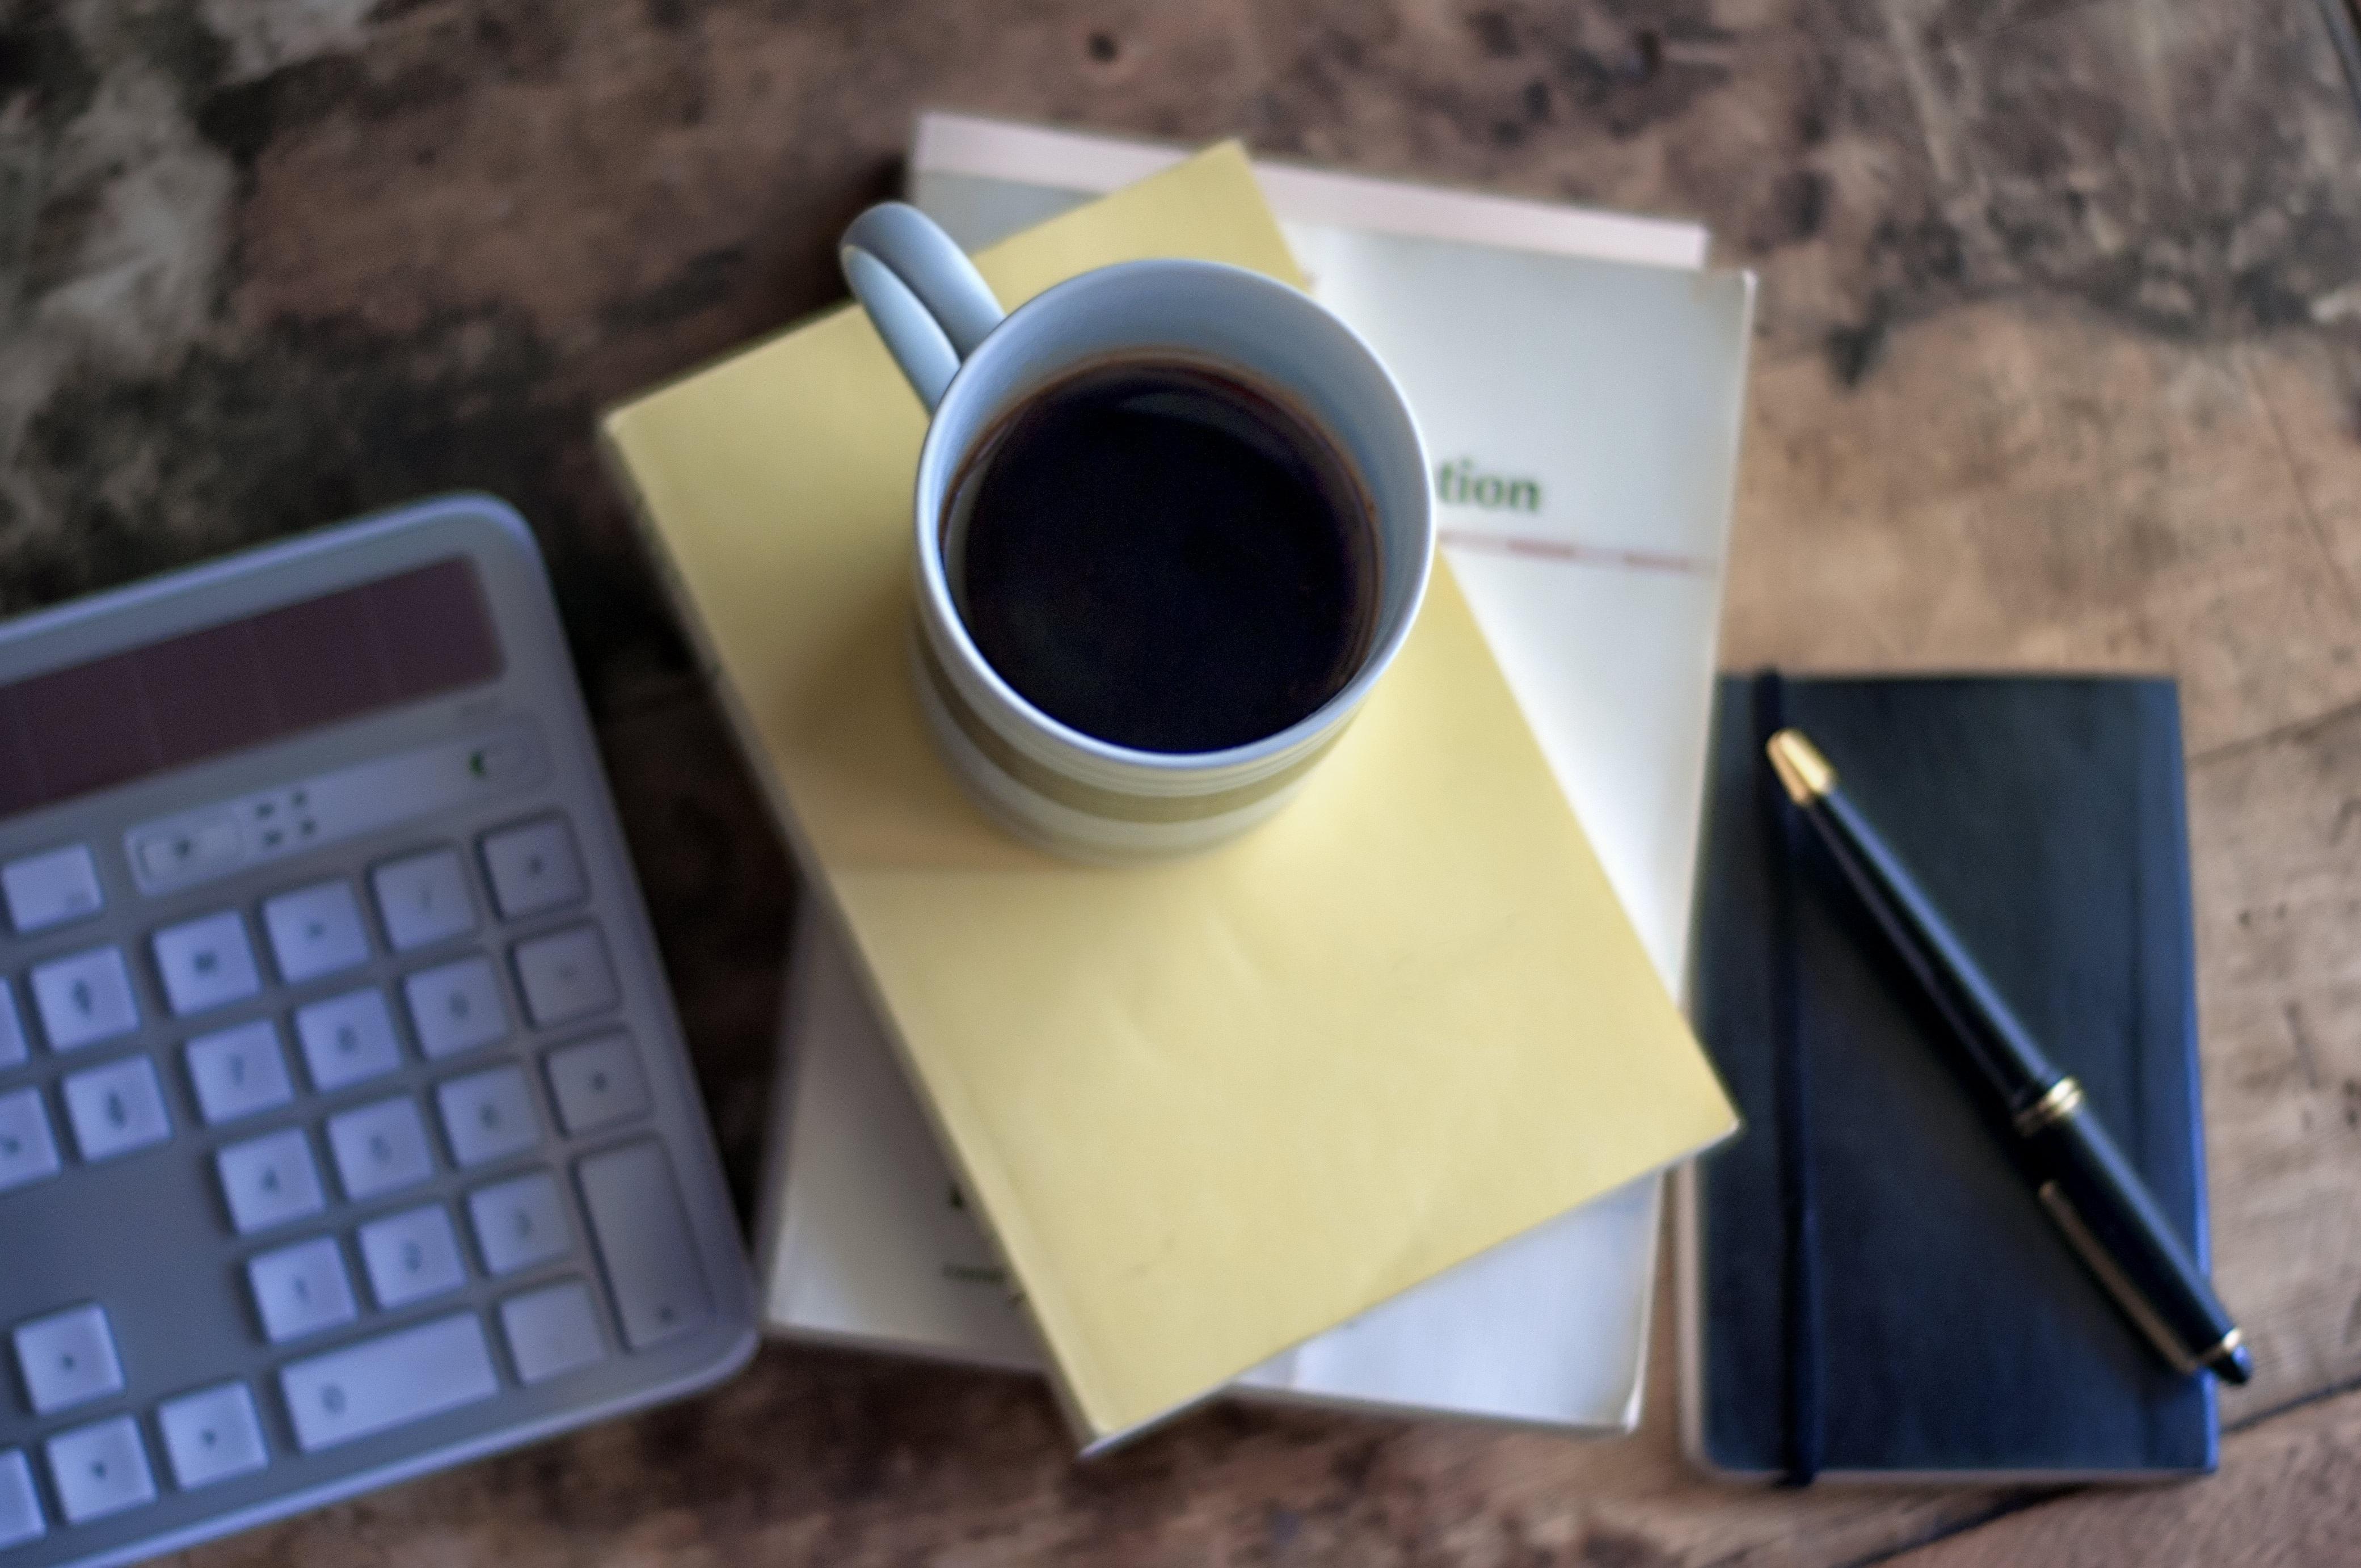 free images notebook computer writing work keyboard pen business mobile phone home. Black Bedroom Furniture Sets. Home Design Ideas